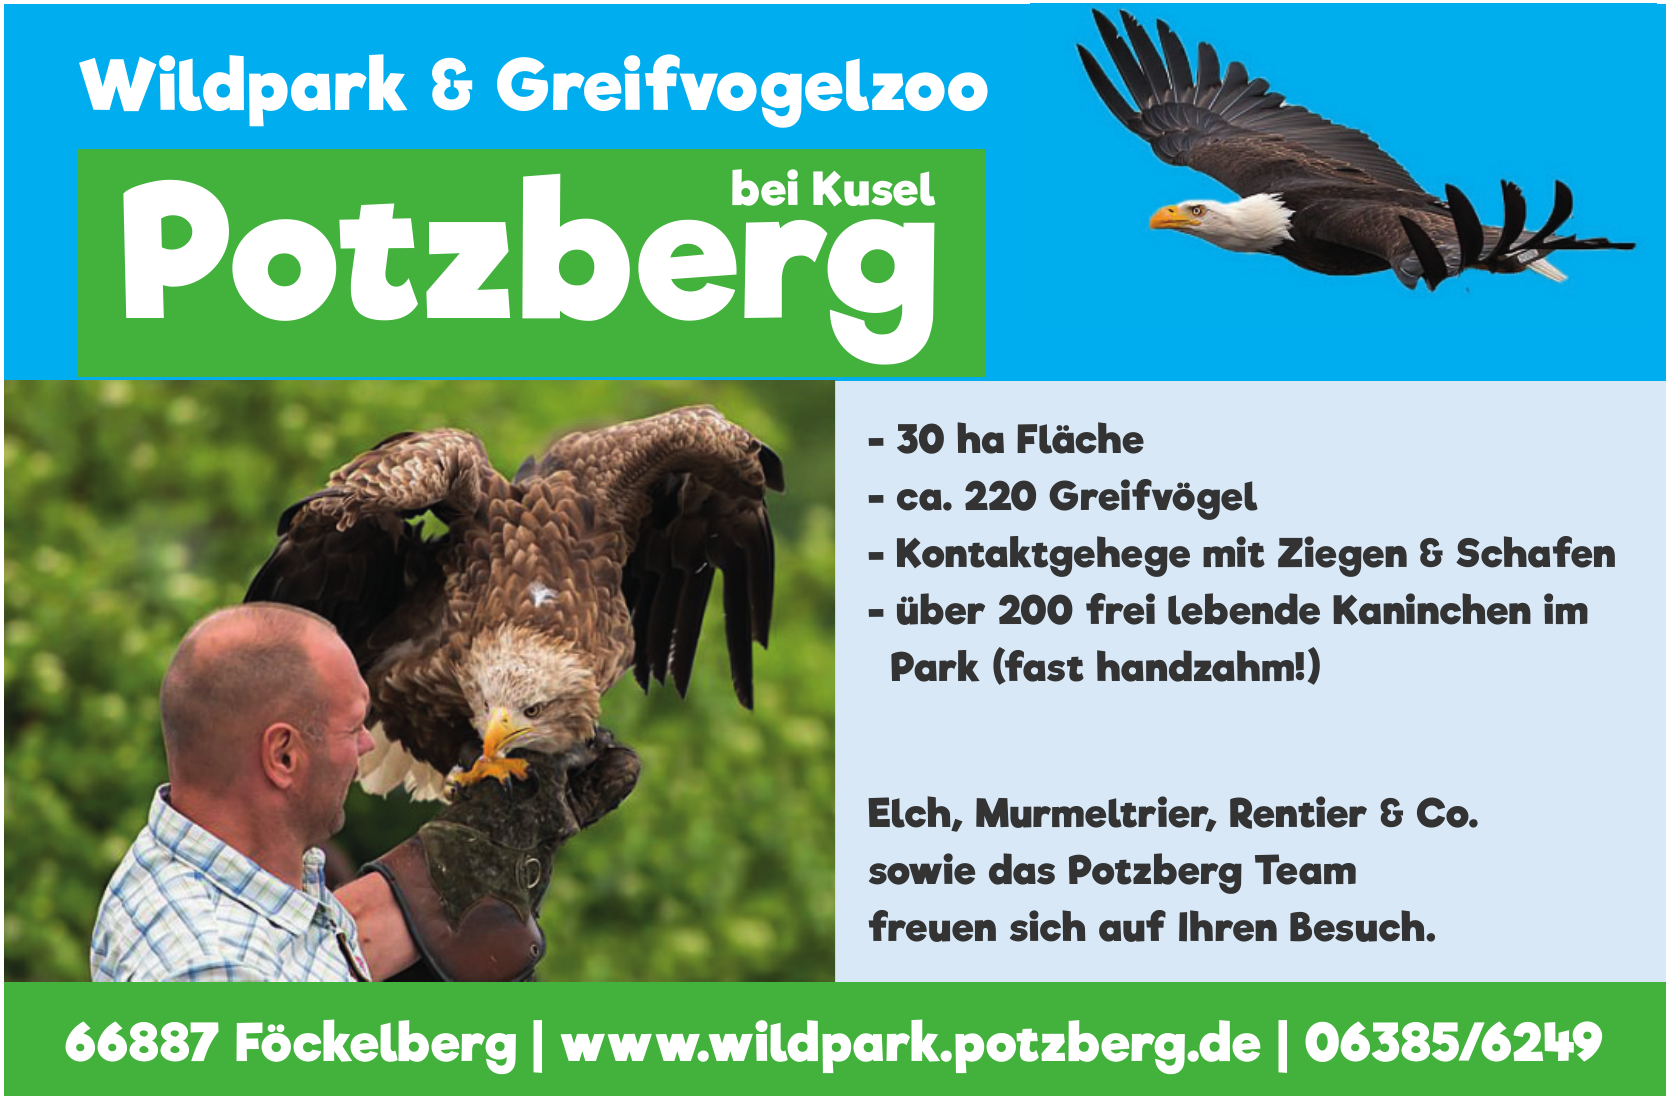 Wildpark & Greifvogelzoo Potzberg